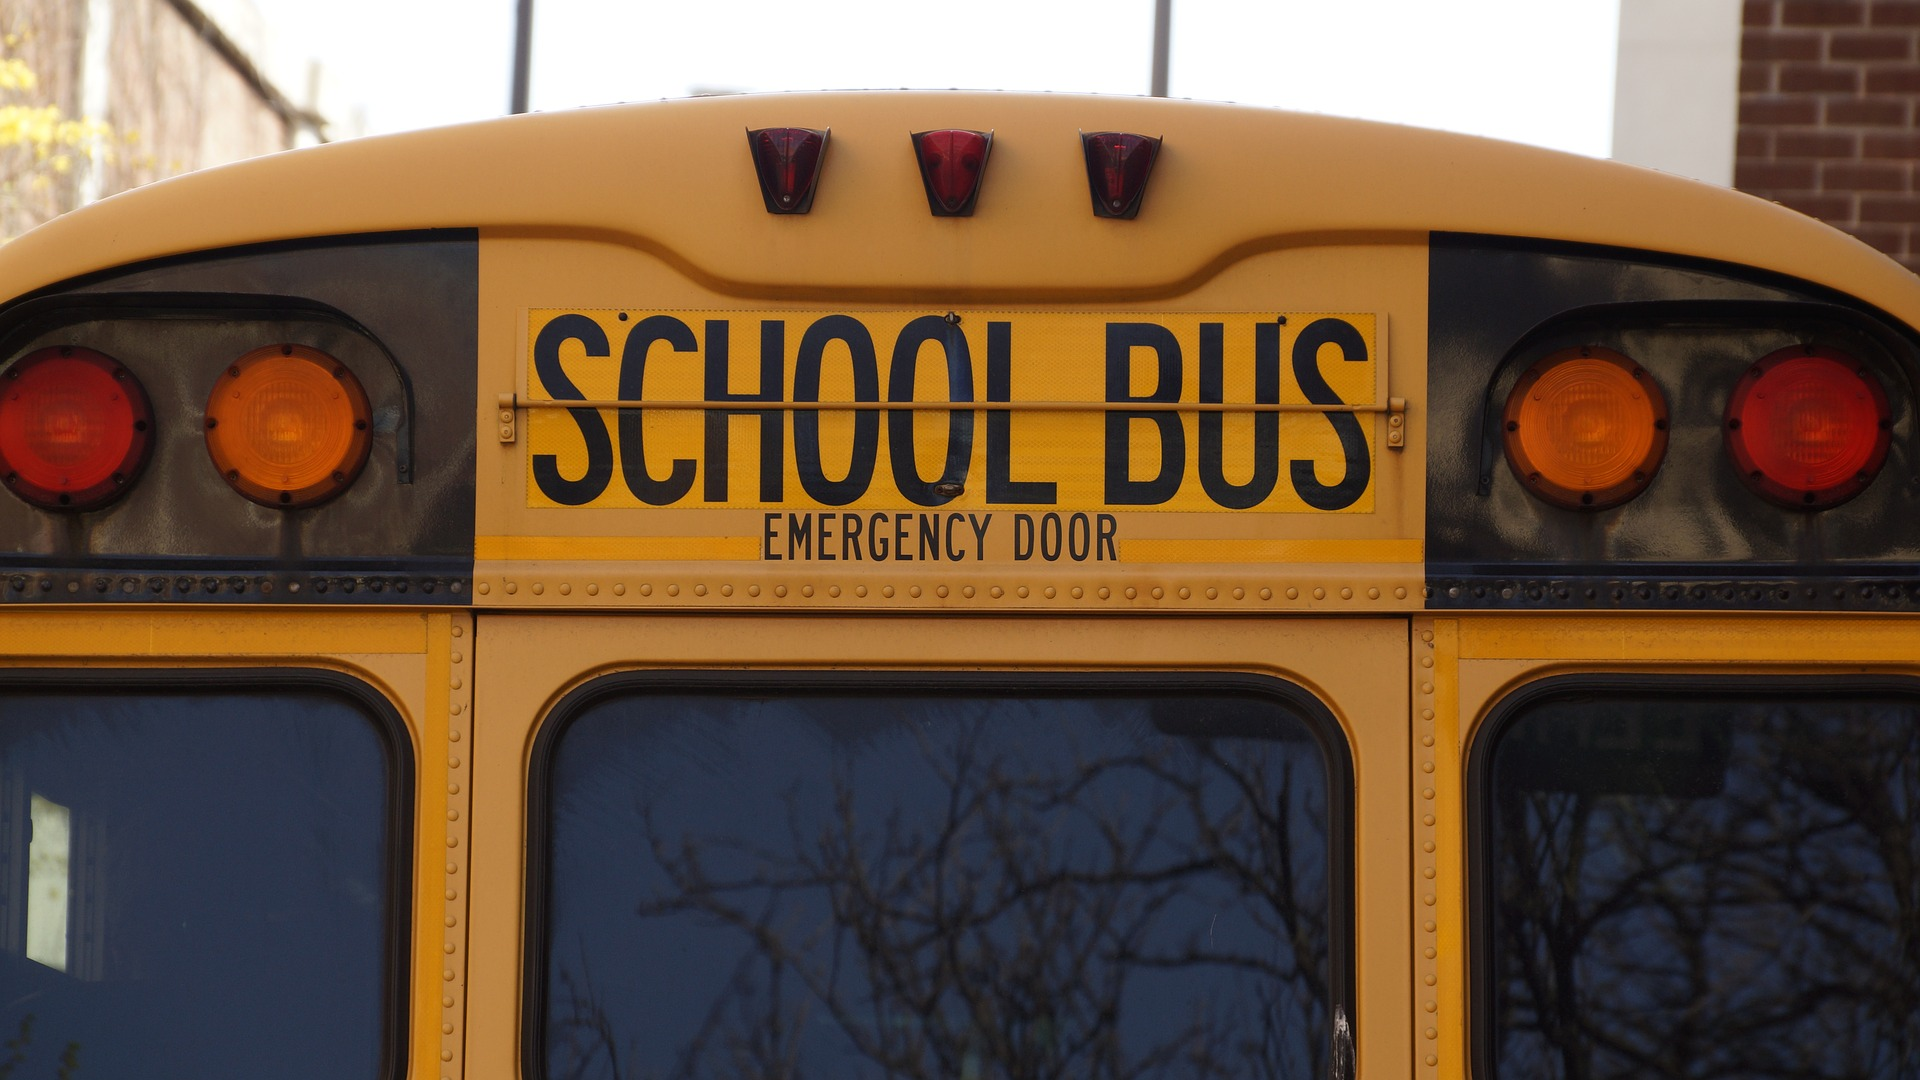 bus-1319360_1920_1547219580699.jpg